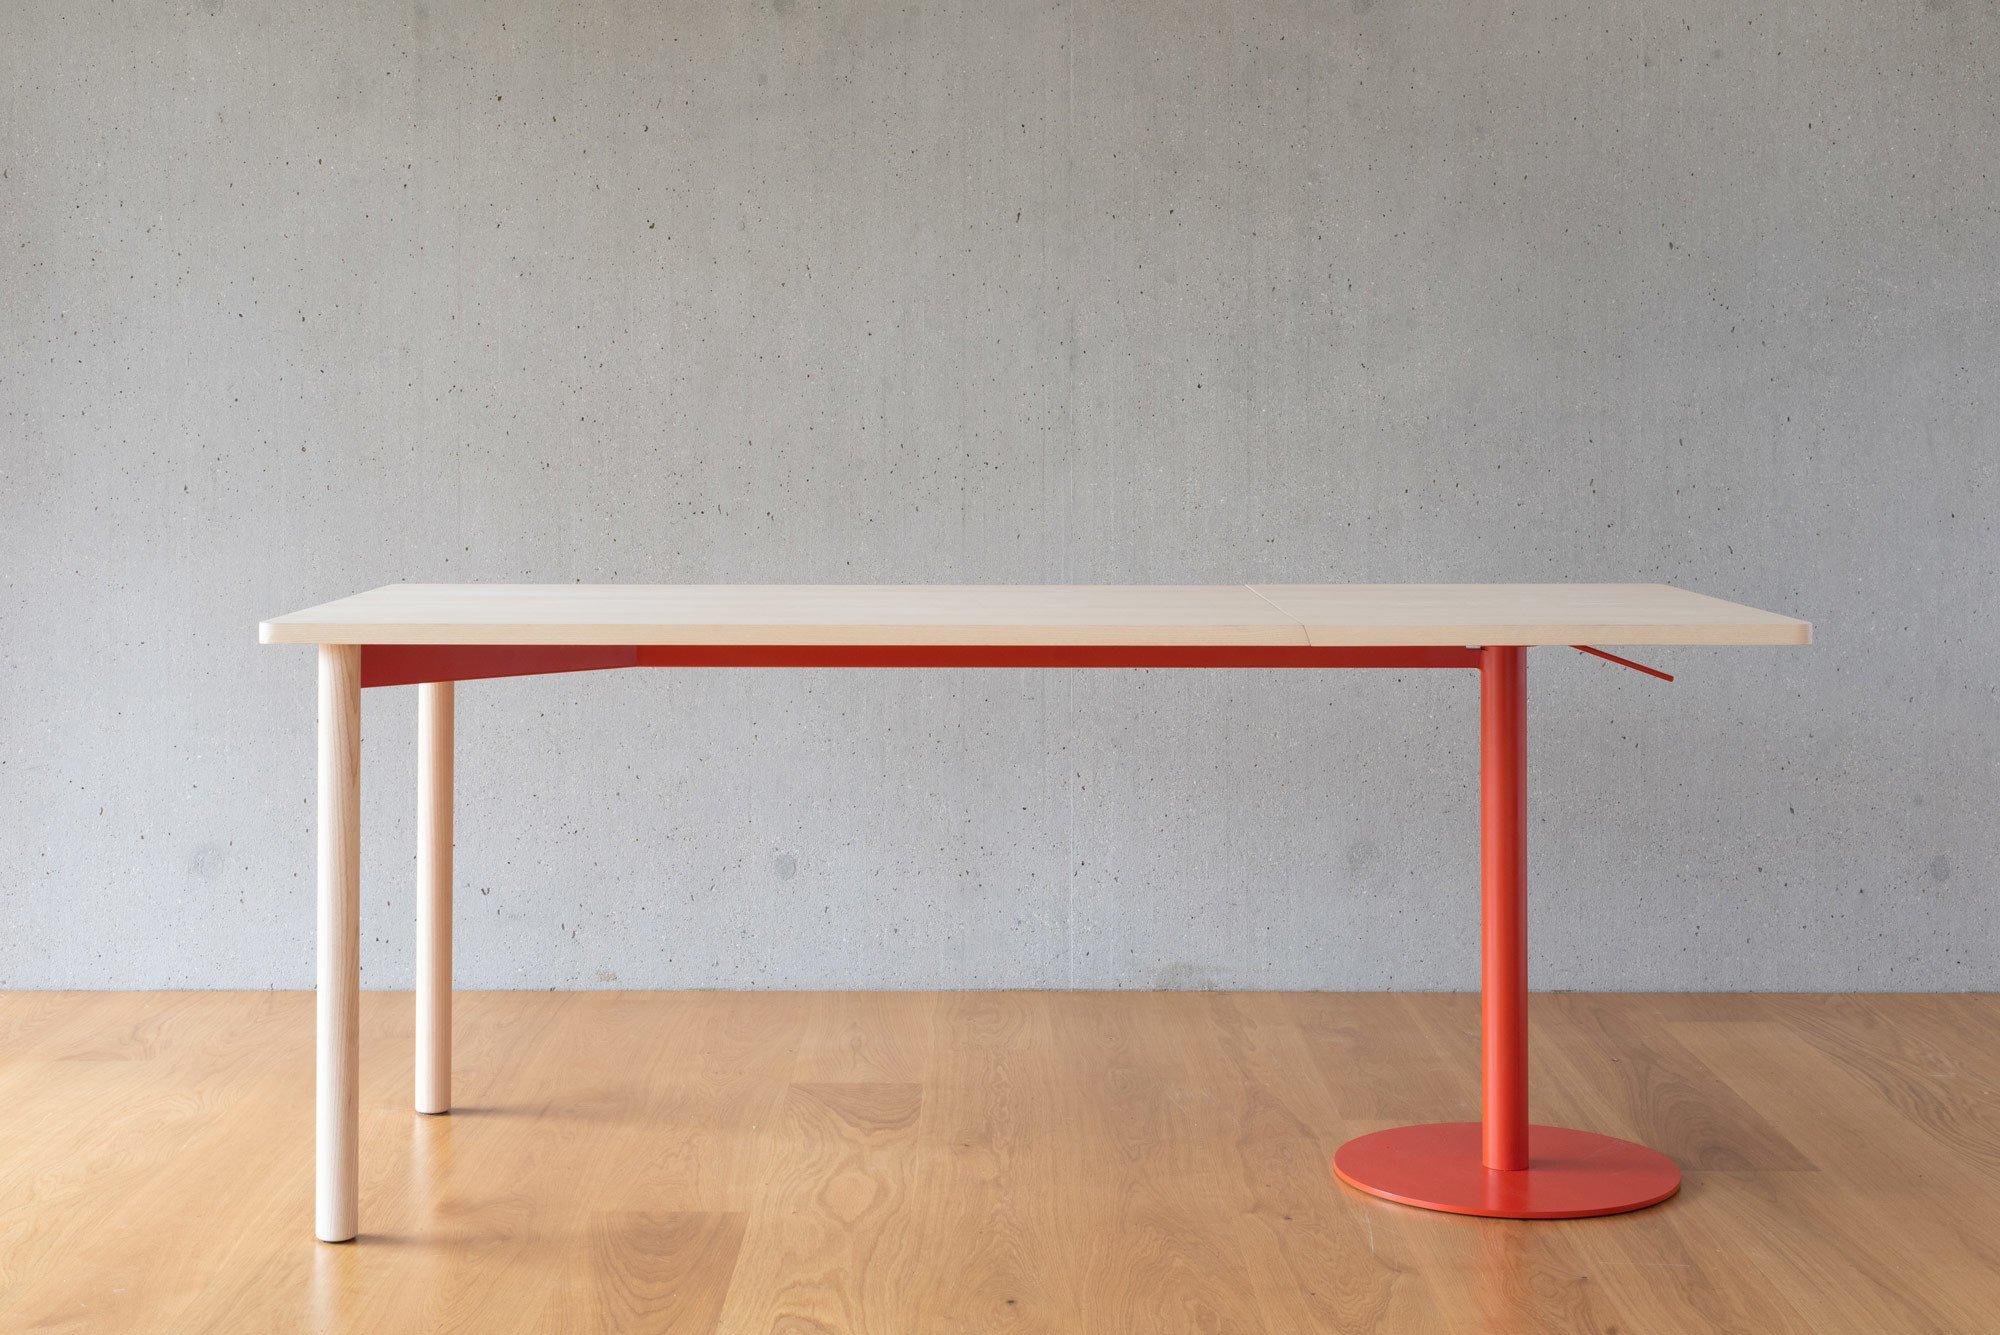 Tisch Emineo, Charlotte Krzentowski, ECAL Ecole cantonale d'art de Lausanne, Foto: Olivia Dall'Omo